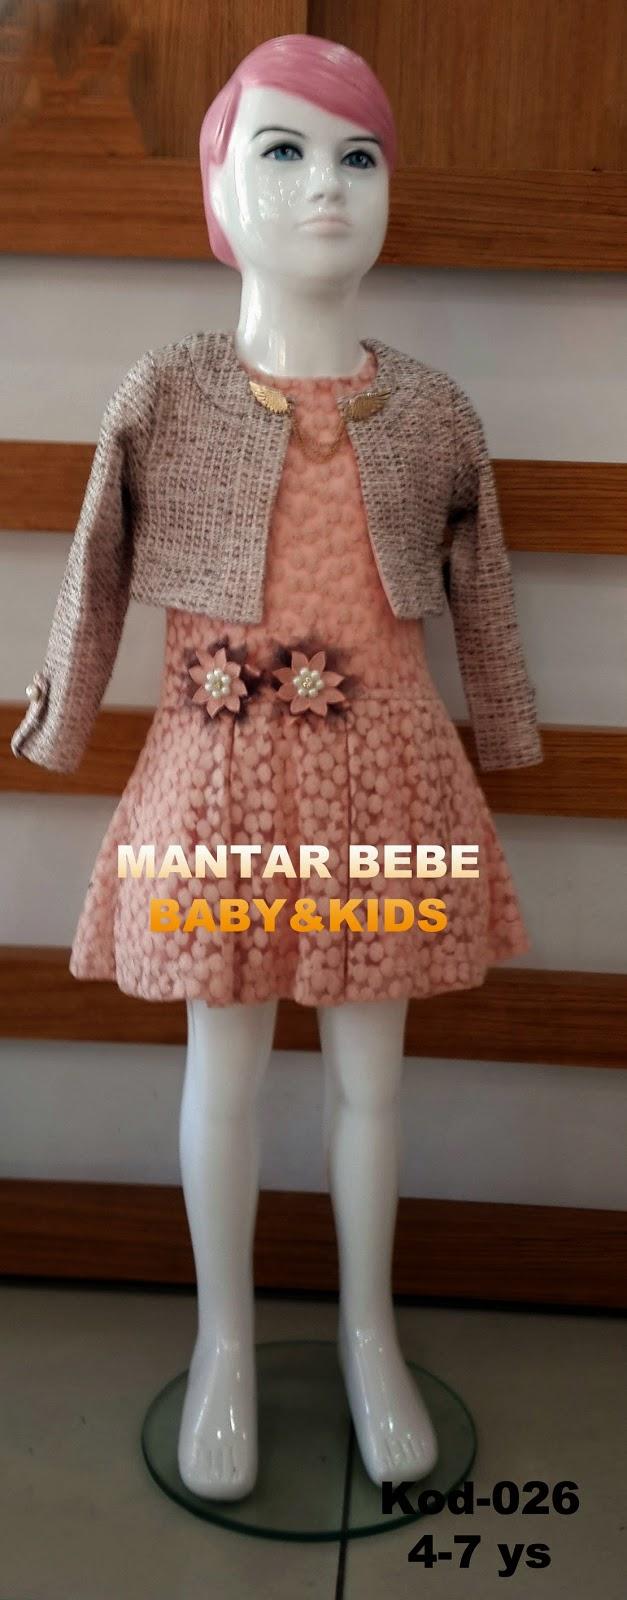 MANTAR BEBE ÇOCUK GİYİM - KOD026